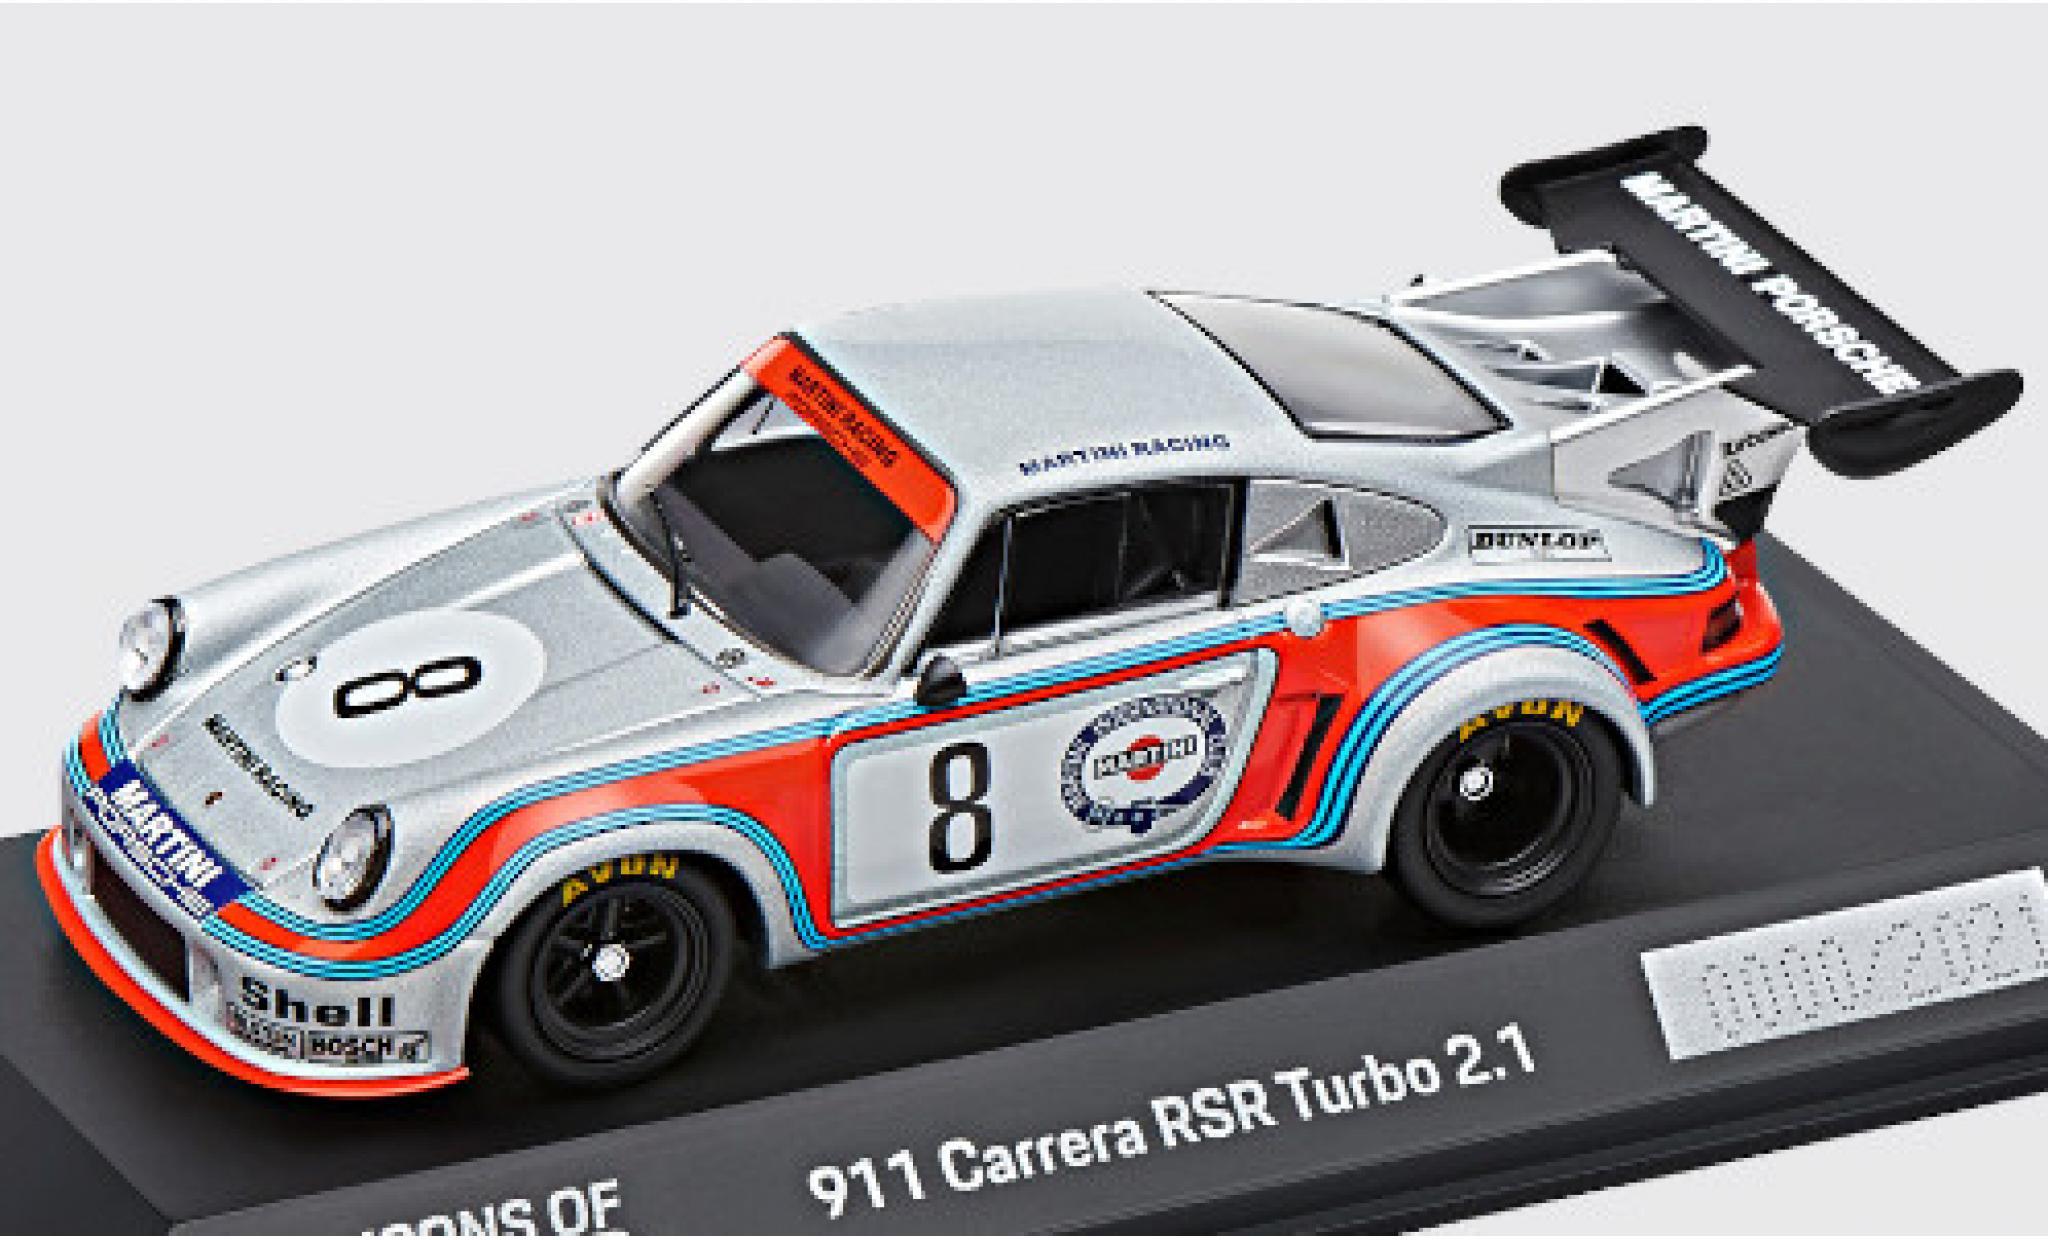 Porsche 930 Turbo 1/43 I Spark 911 Carrera RSR 2.1 No.8 Martini Racing System Martini 1000km Nürburgring 1974 H.Müller/G.van Lennep